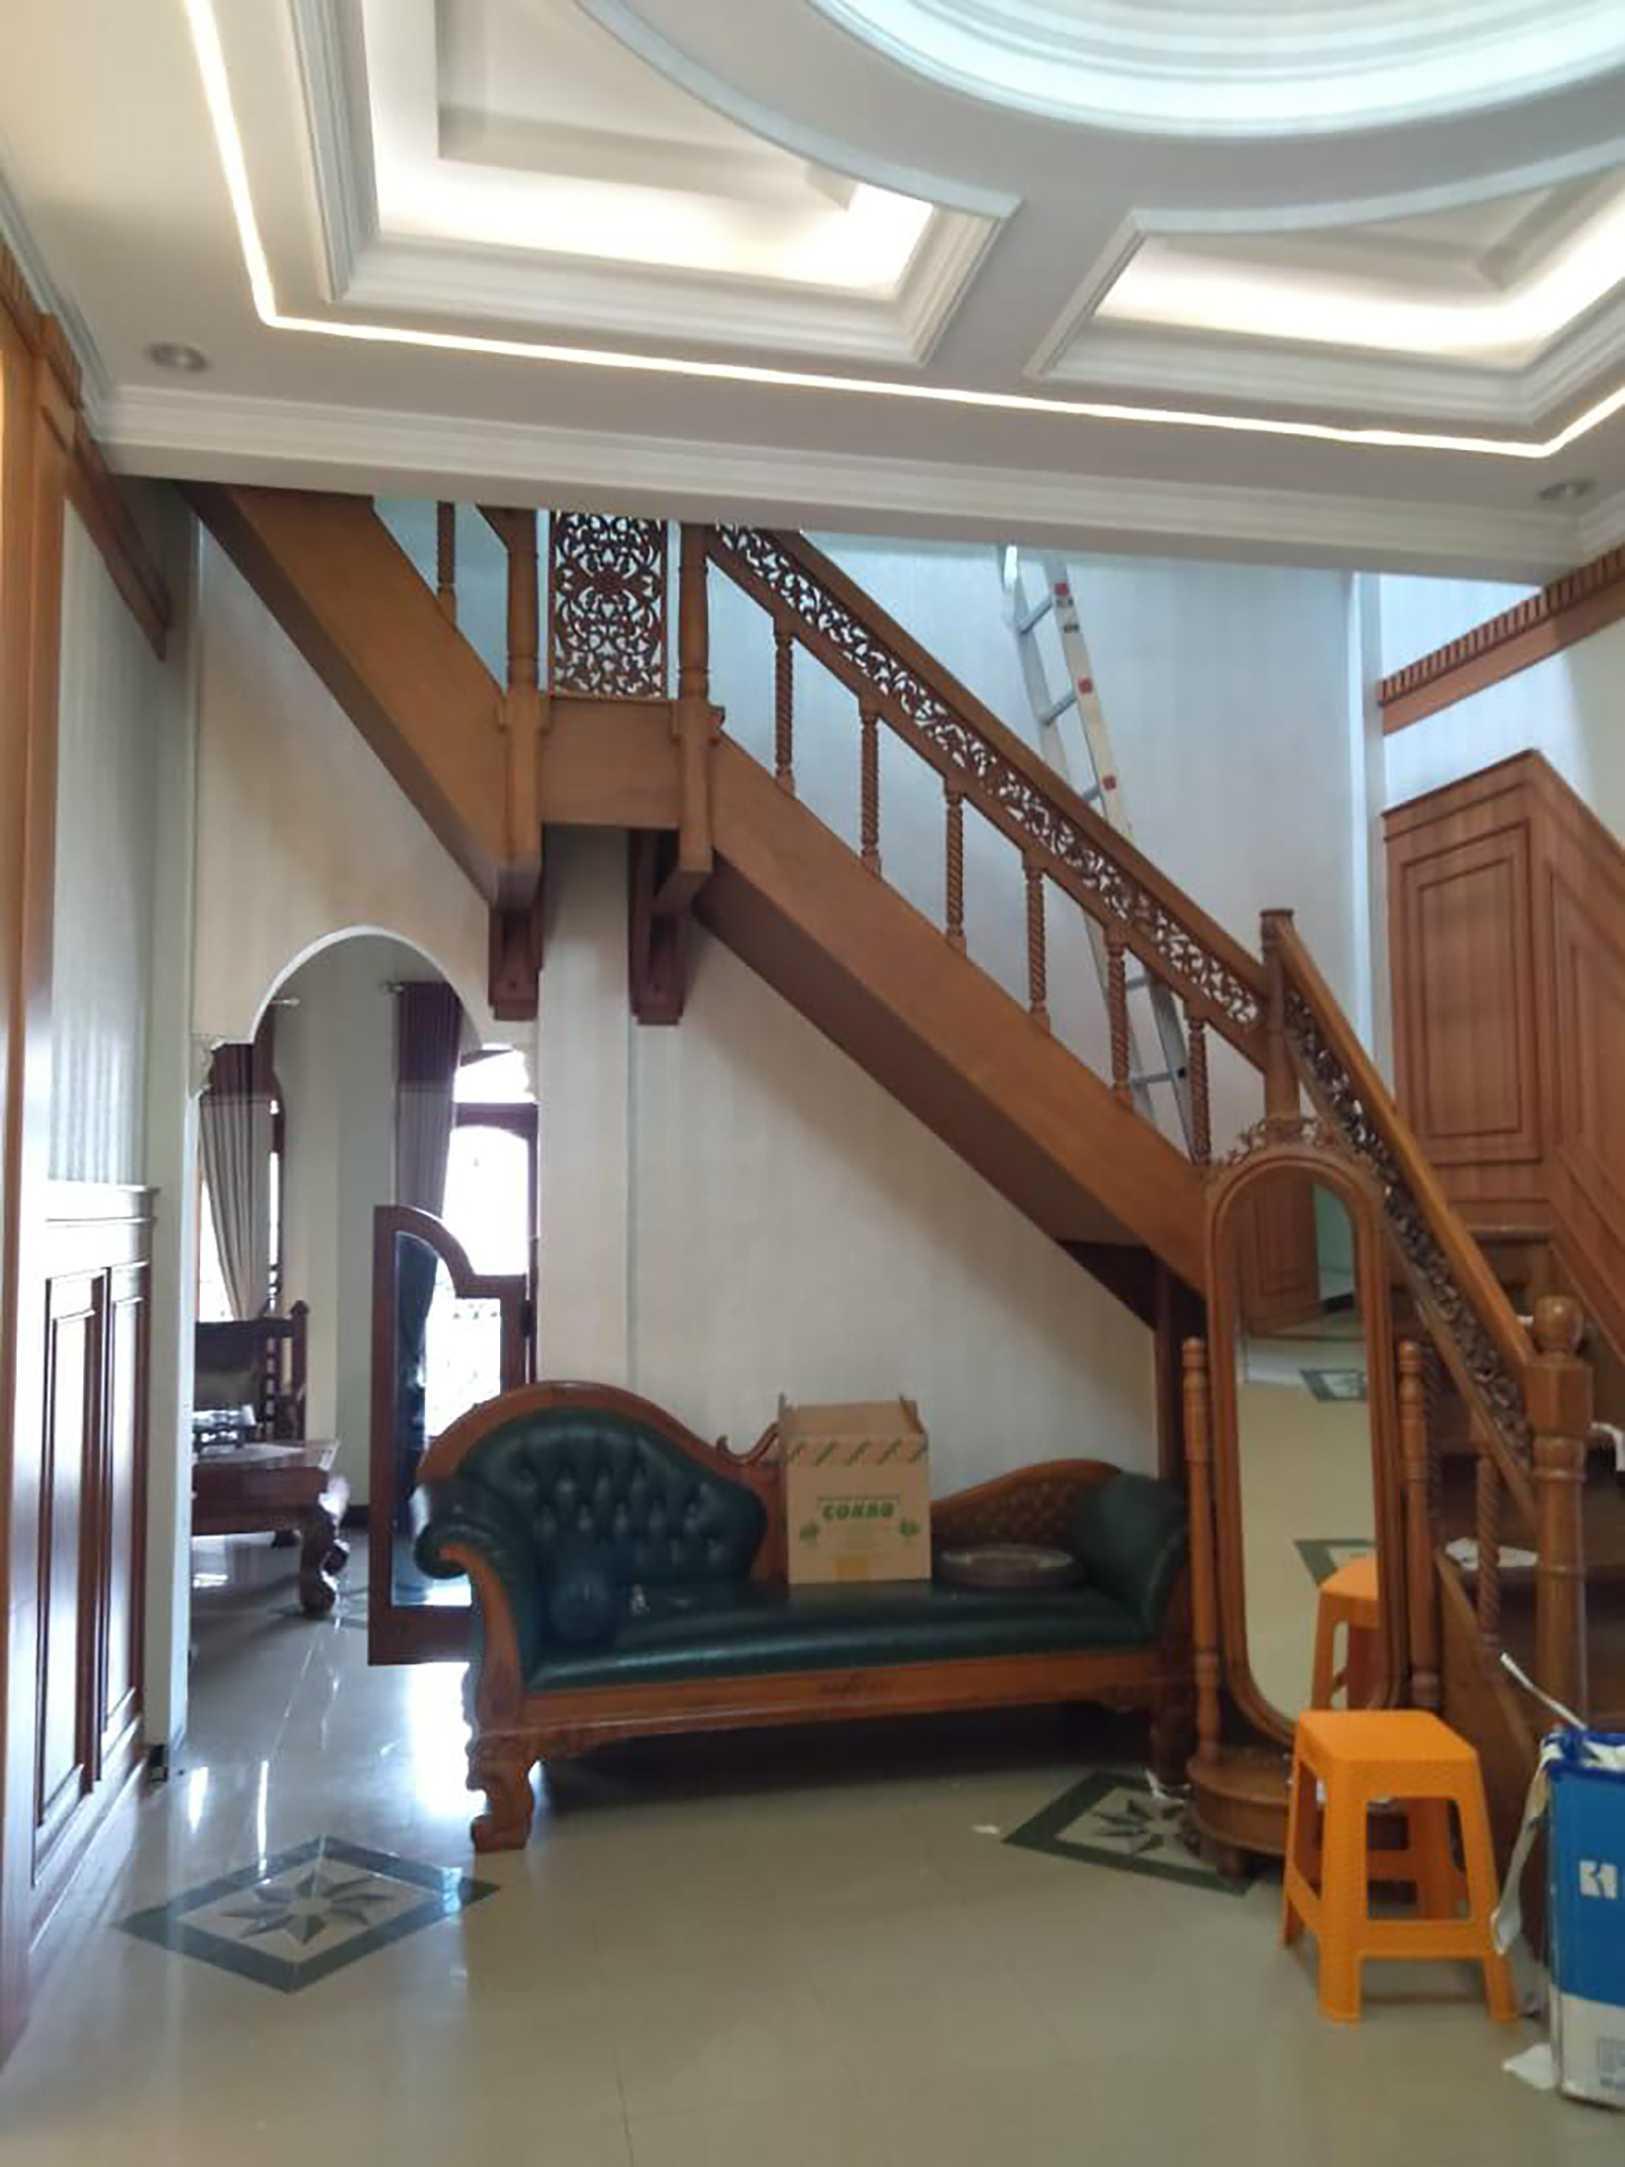 Sintesa Arkitek Interior Ruang Keluarga Madiun, Kota Madiun, Jawa Timur, Indonesia Madiun, Kota Madiun, Jawa Timur, Indonesia Interior Iv Classic  133524